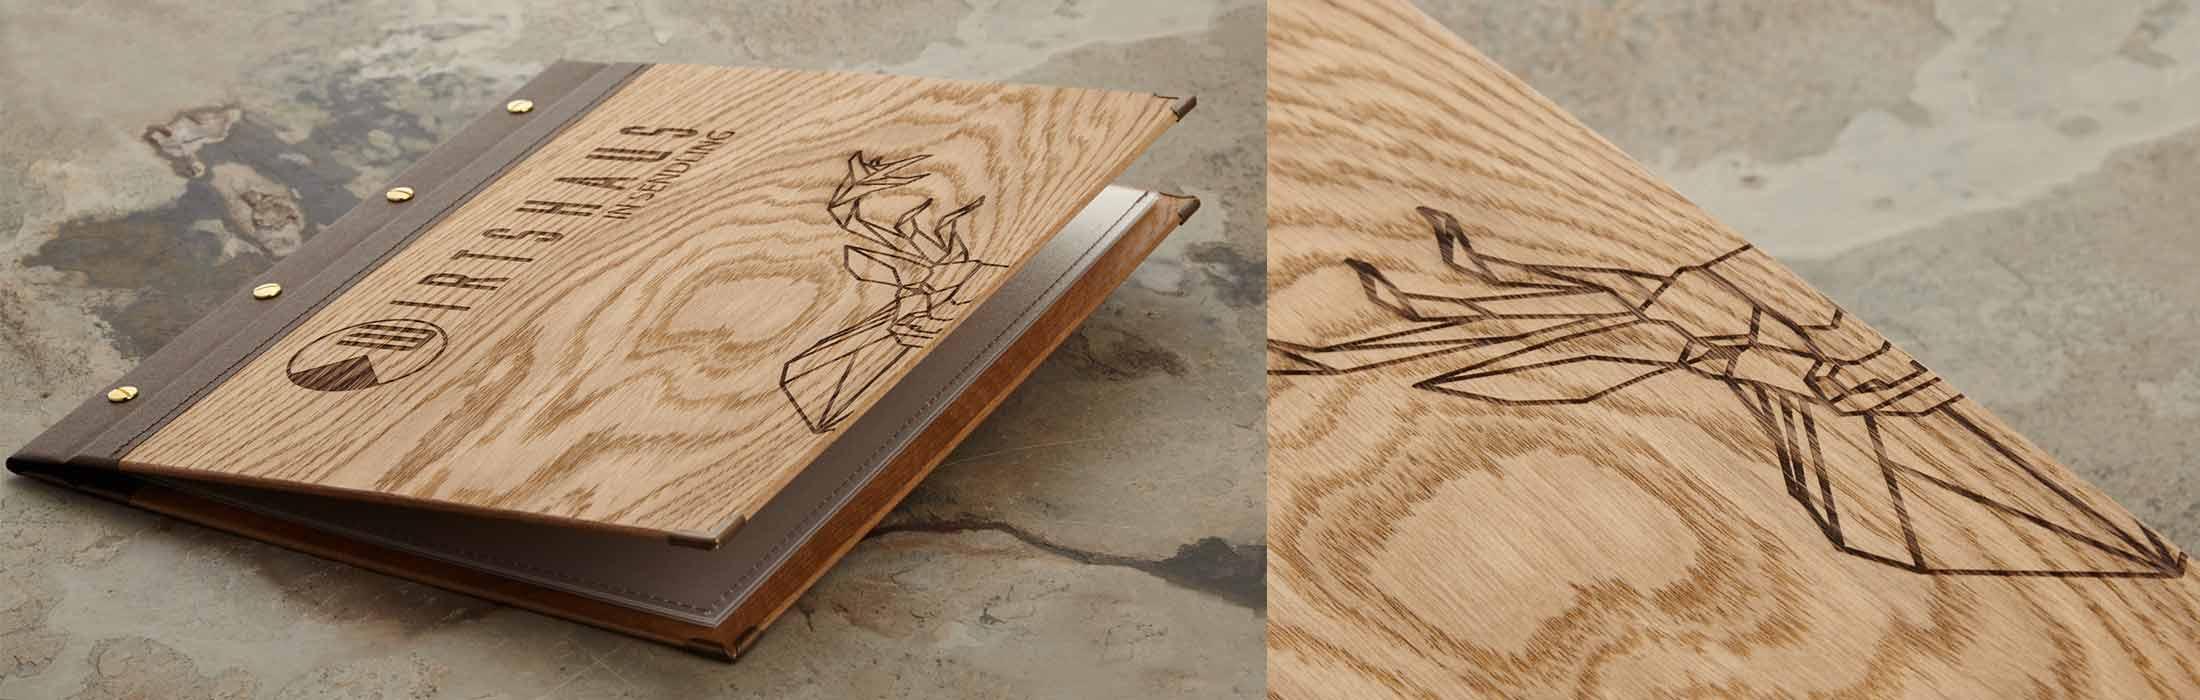 Gastrotopcard Speisekarte Modell Select aus Holz mit Branding